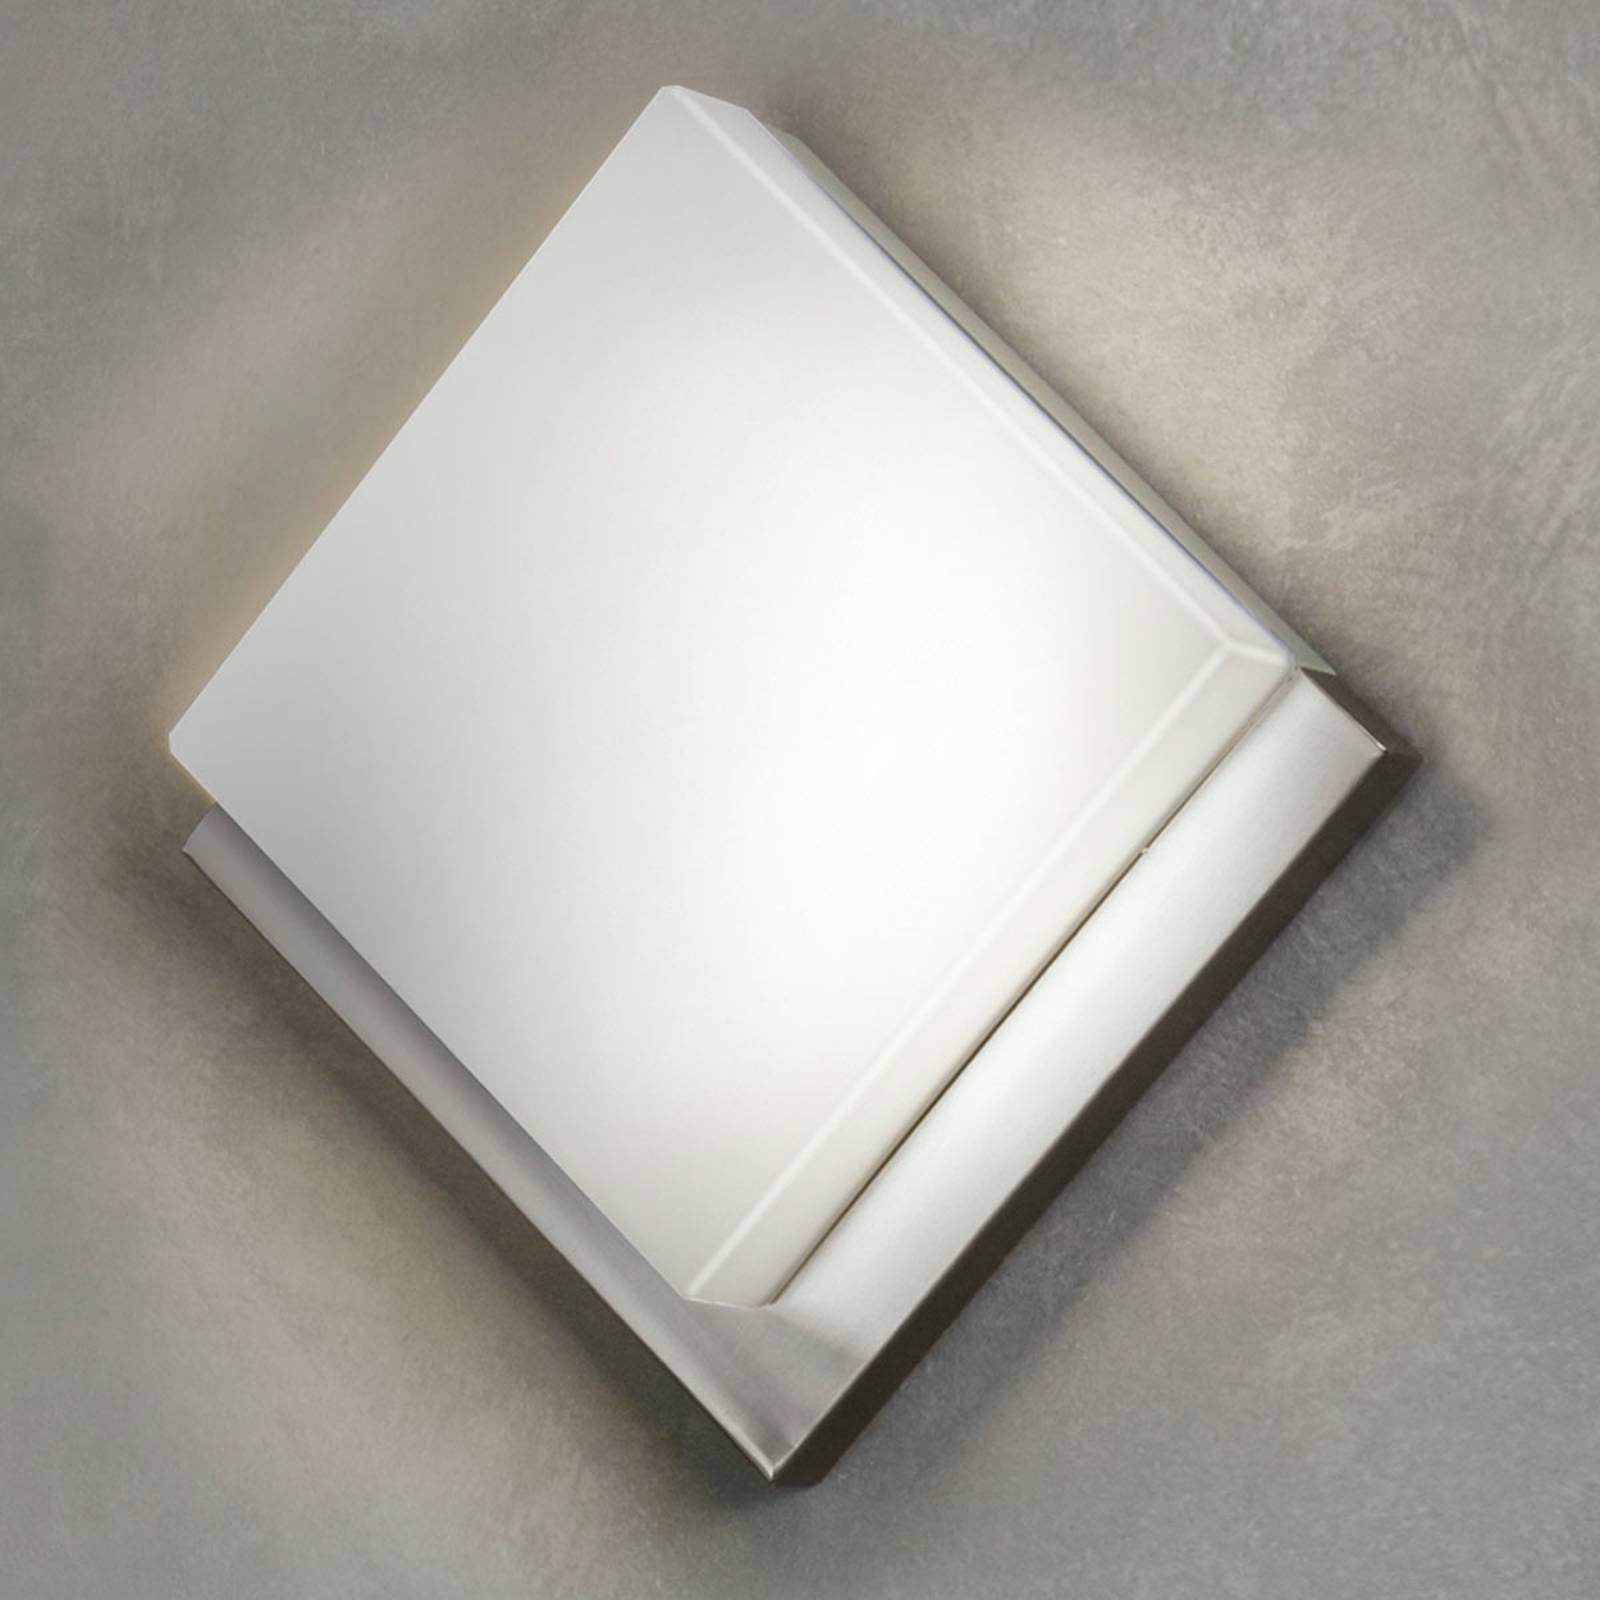 Ruitvormige LED buitenwandlamp Infesto 1